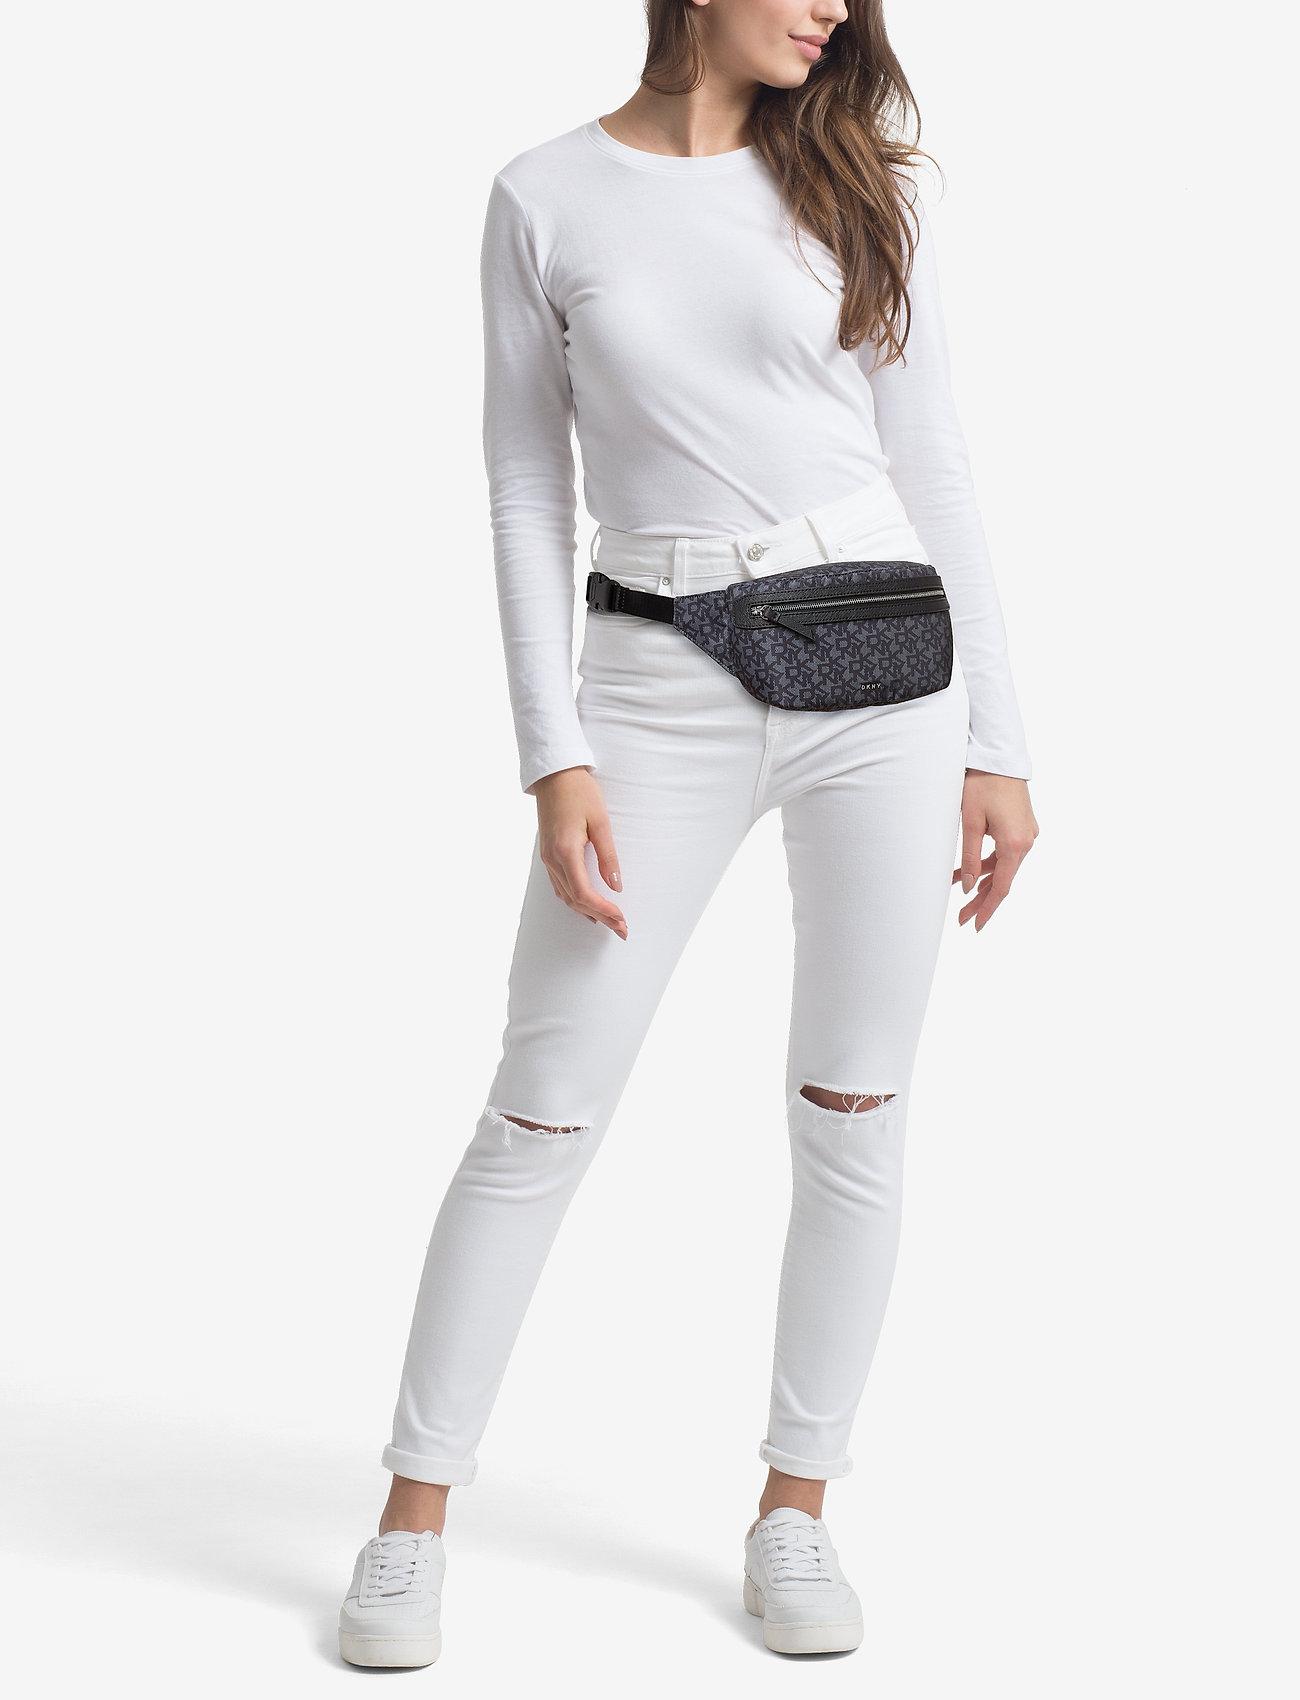 DKNY Bags CASEY-BELT BAG-T&C L - BK LOGO-BK